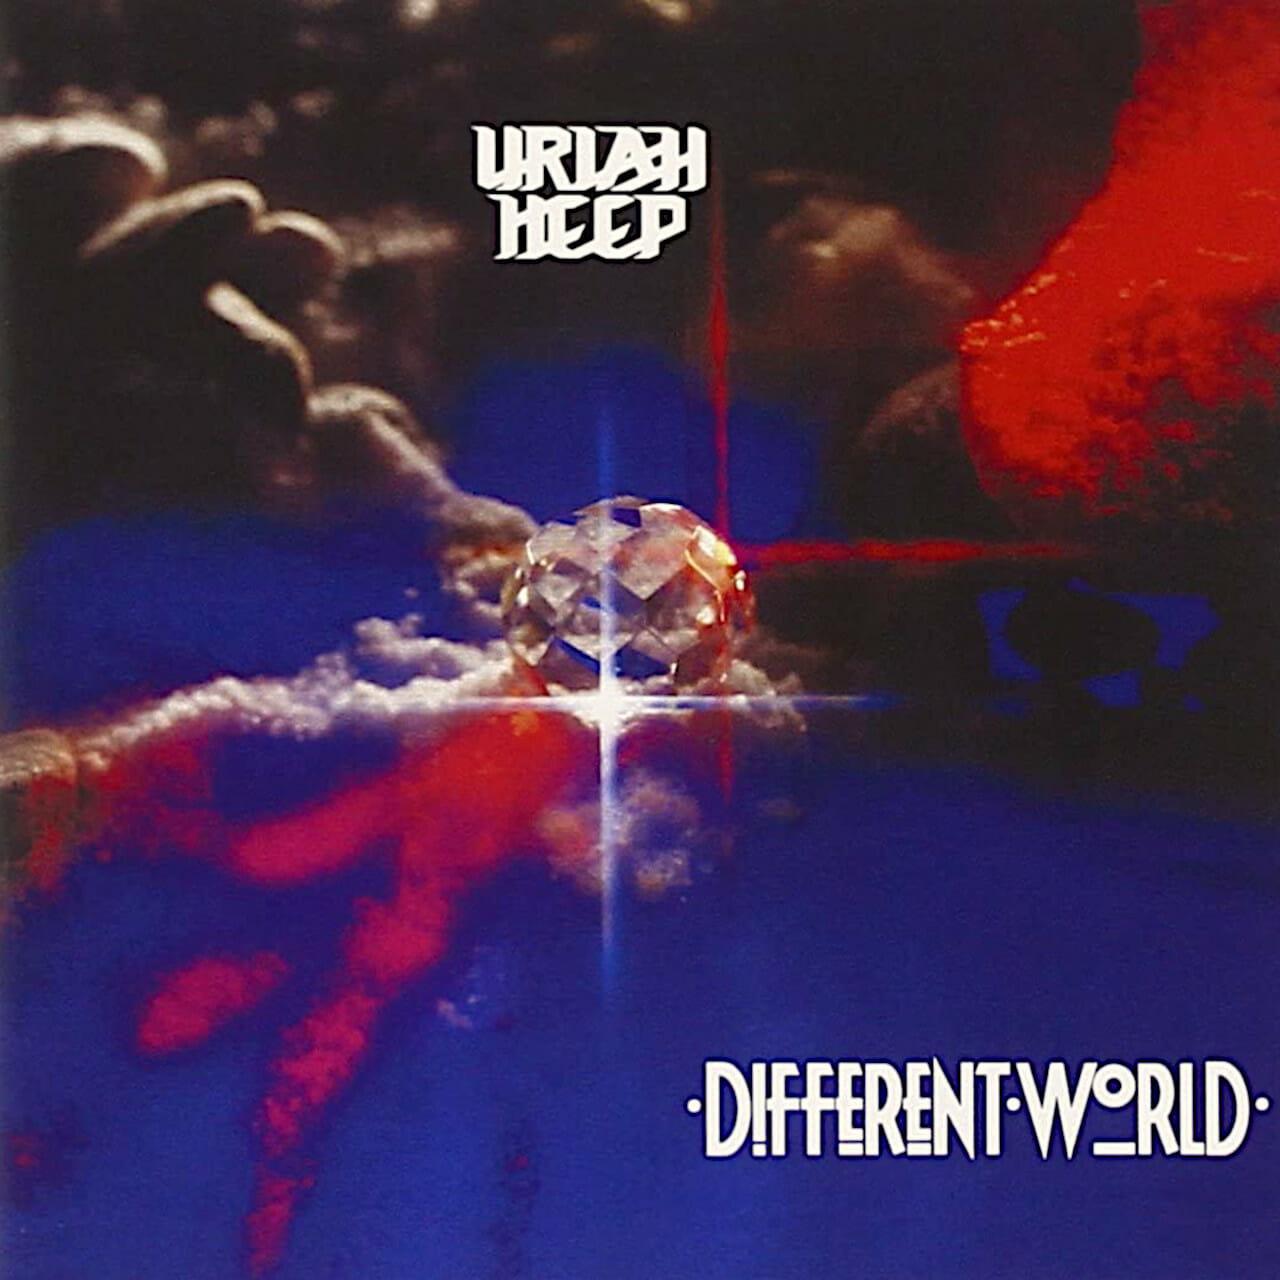 Uriah Heep Mundo diferente